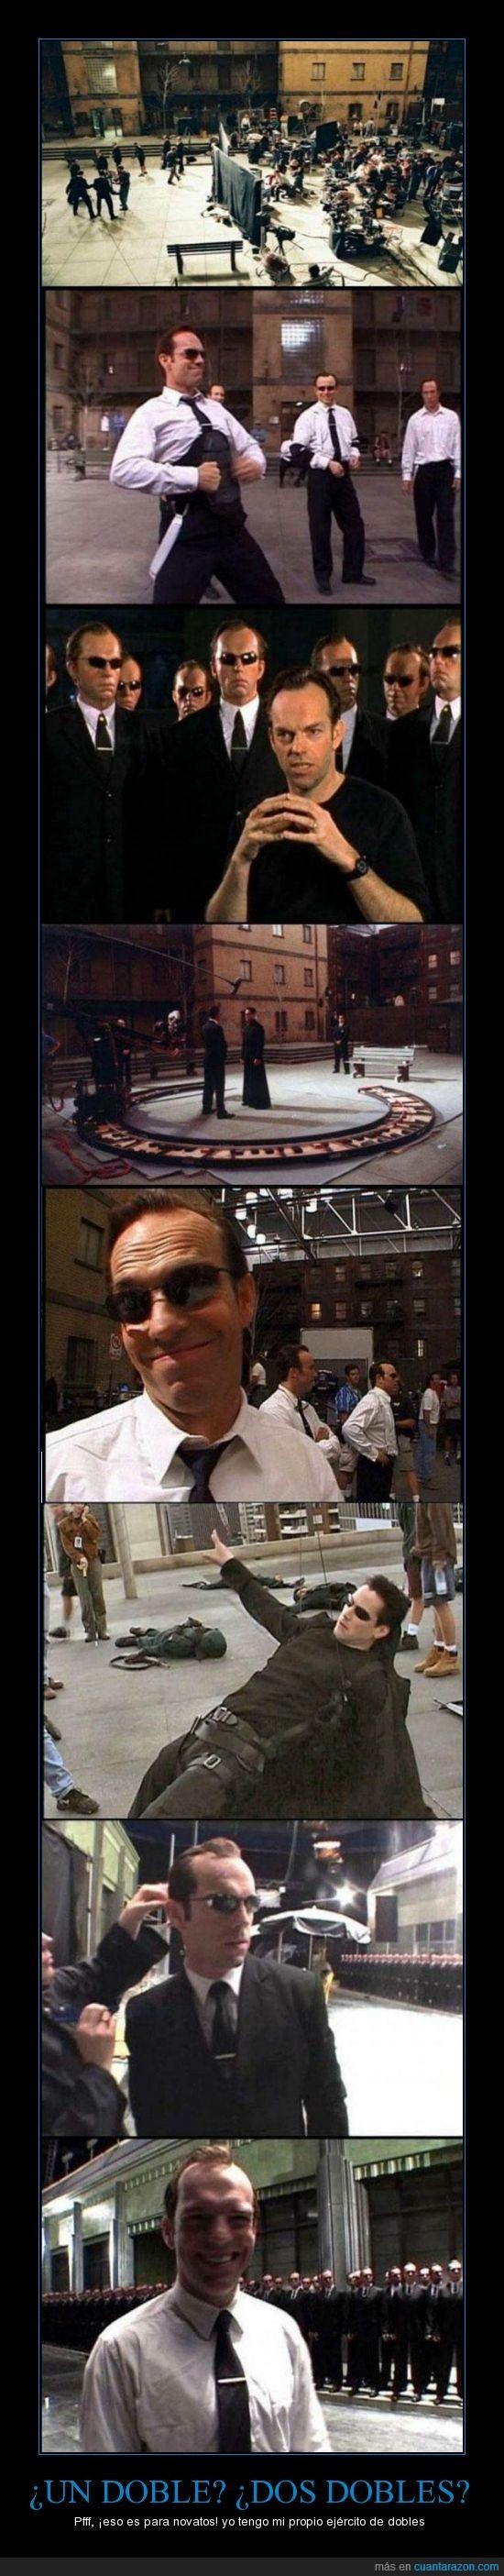 dobles,ejercito,escena,inolvidable,matrix